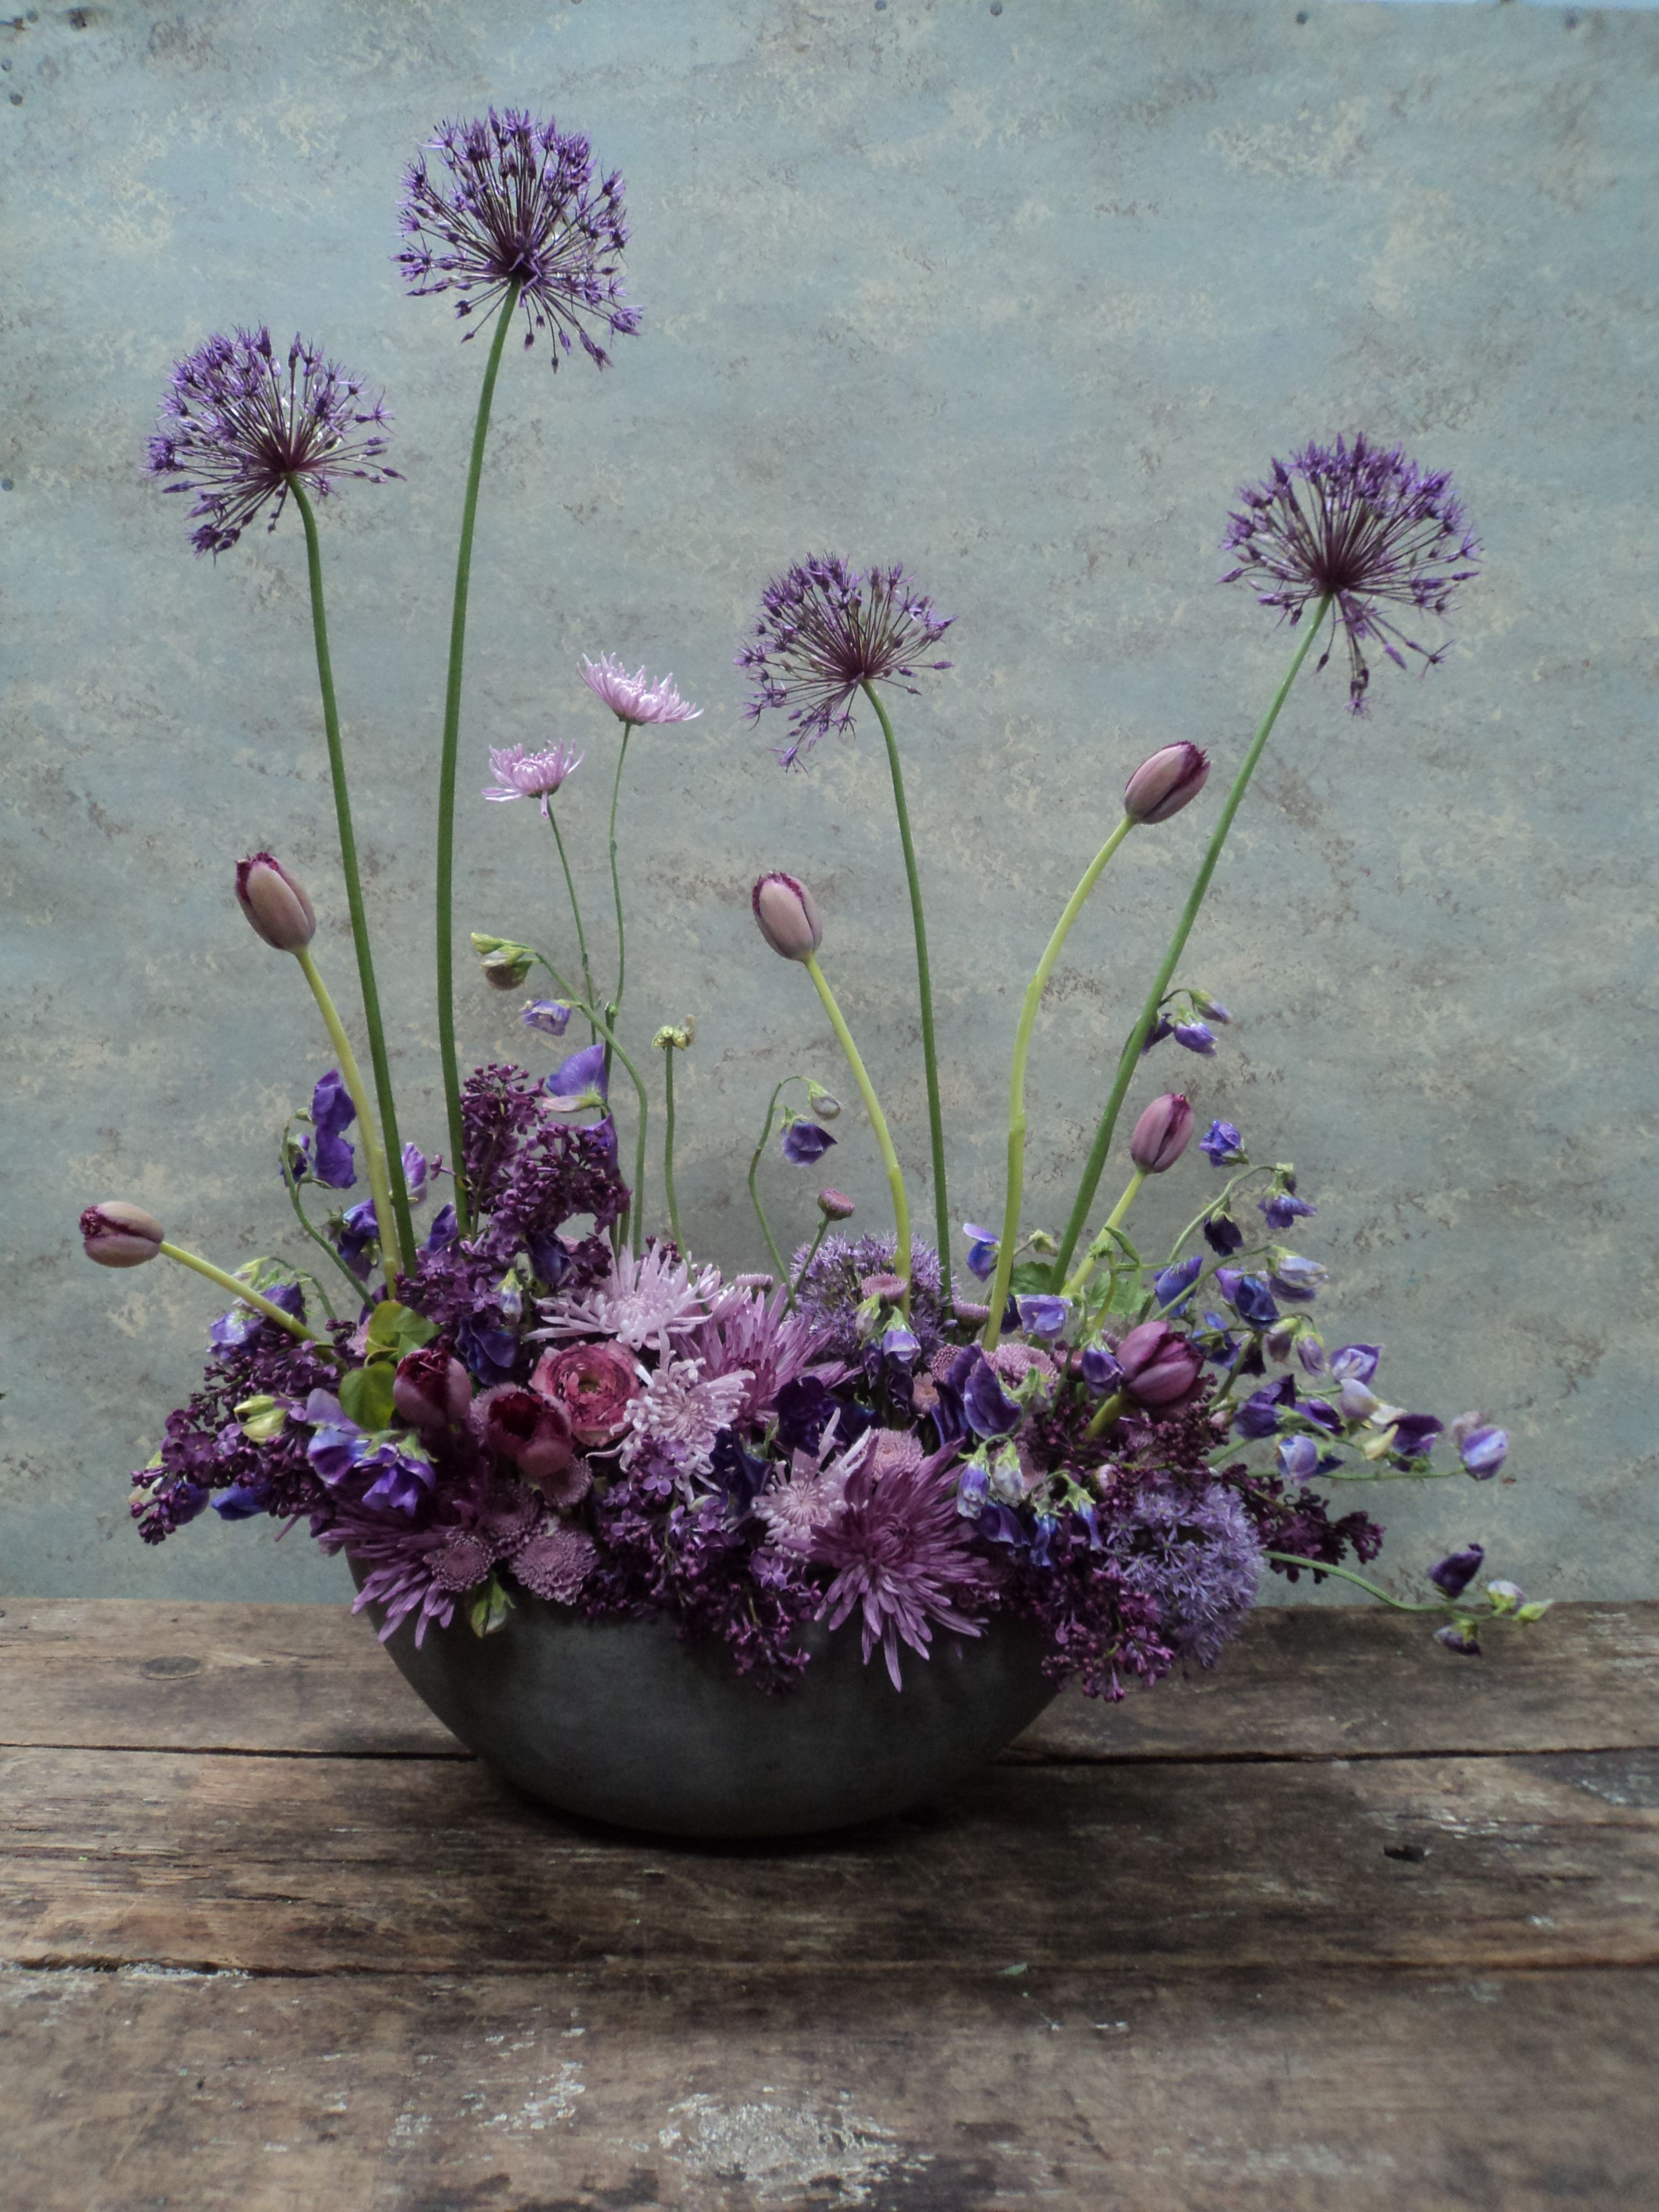 Best Florists L.A. - Moon Canyon Design, Lili Cuzor